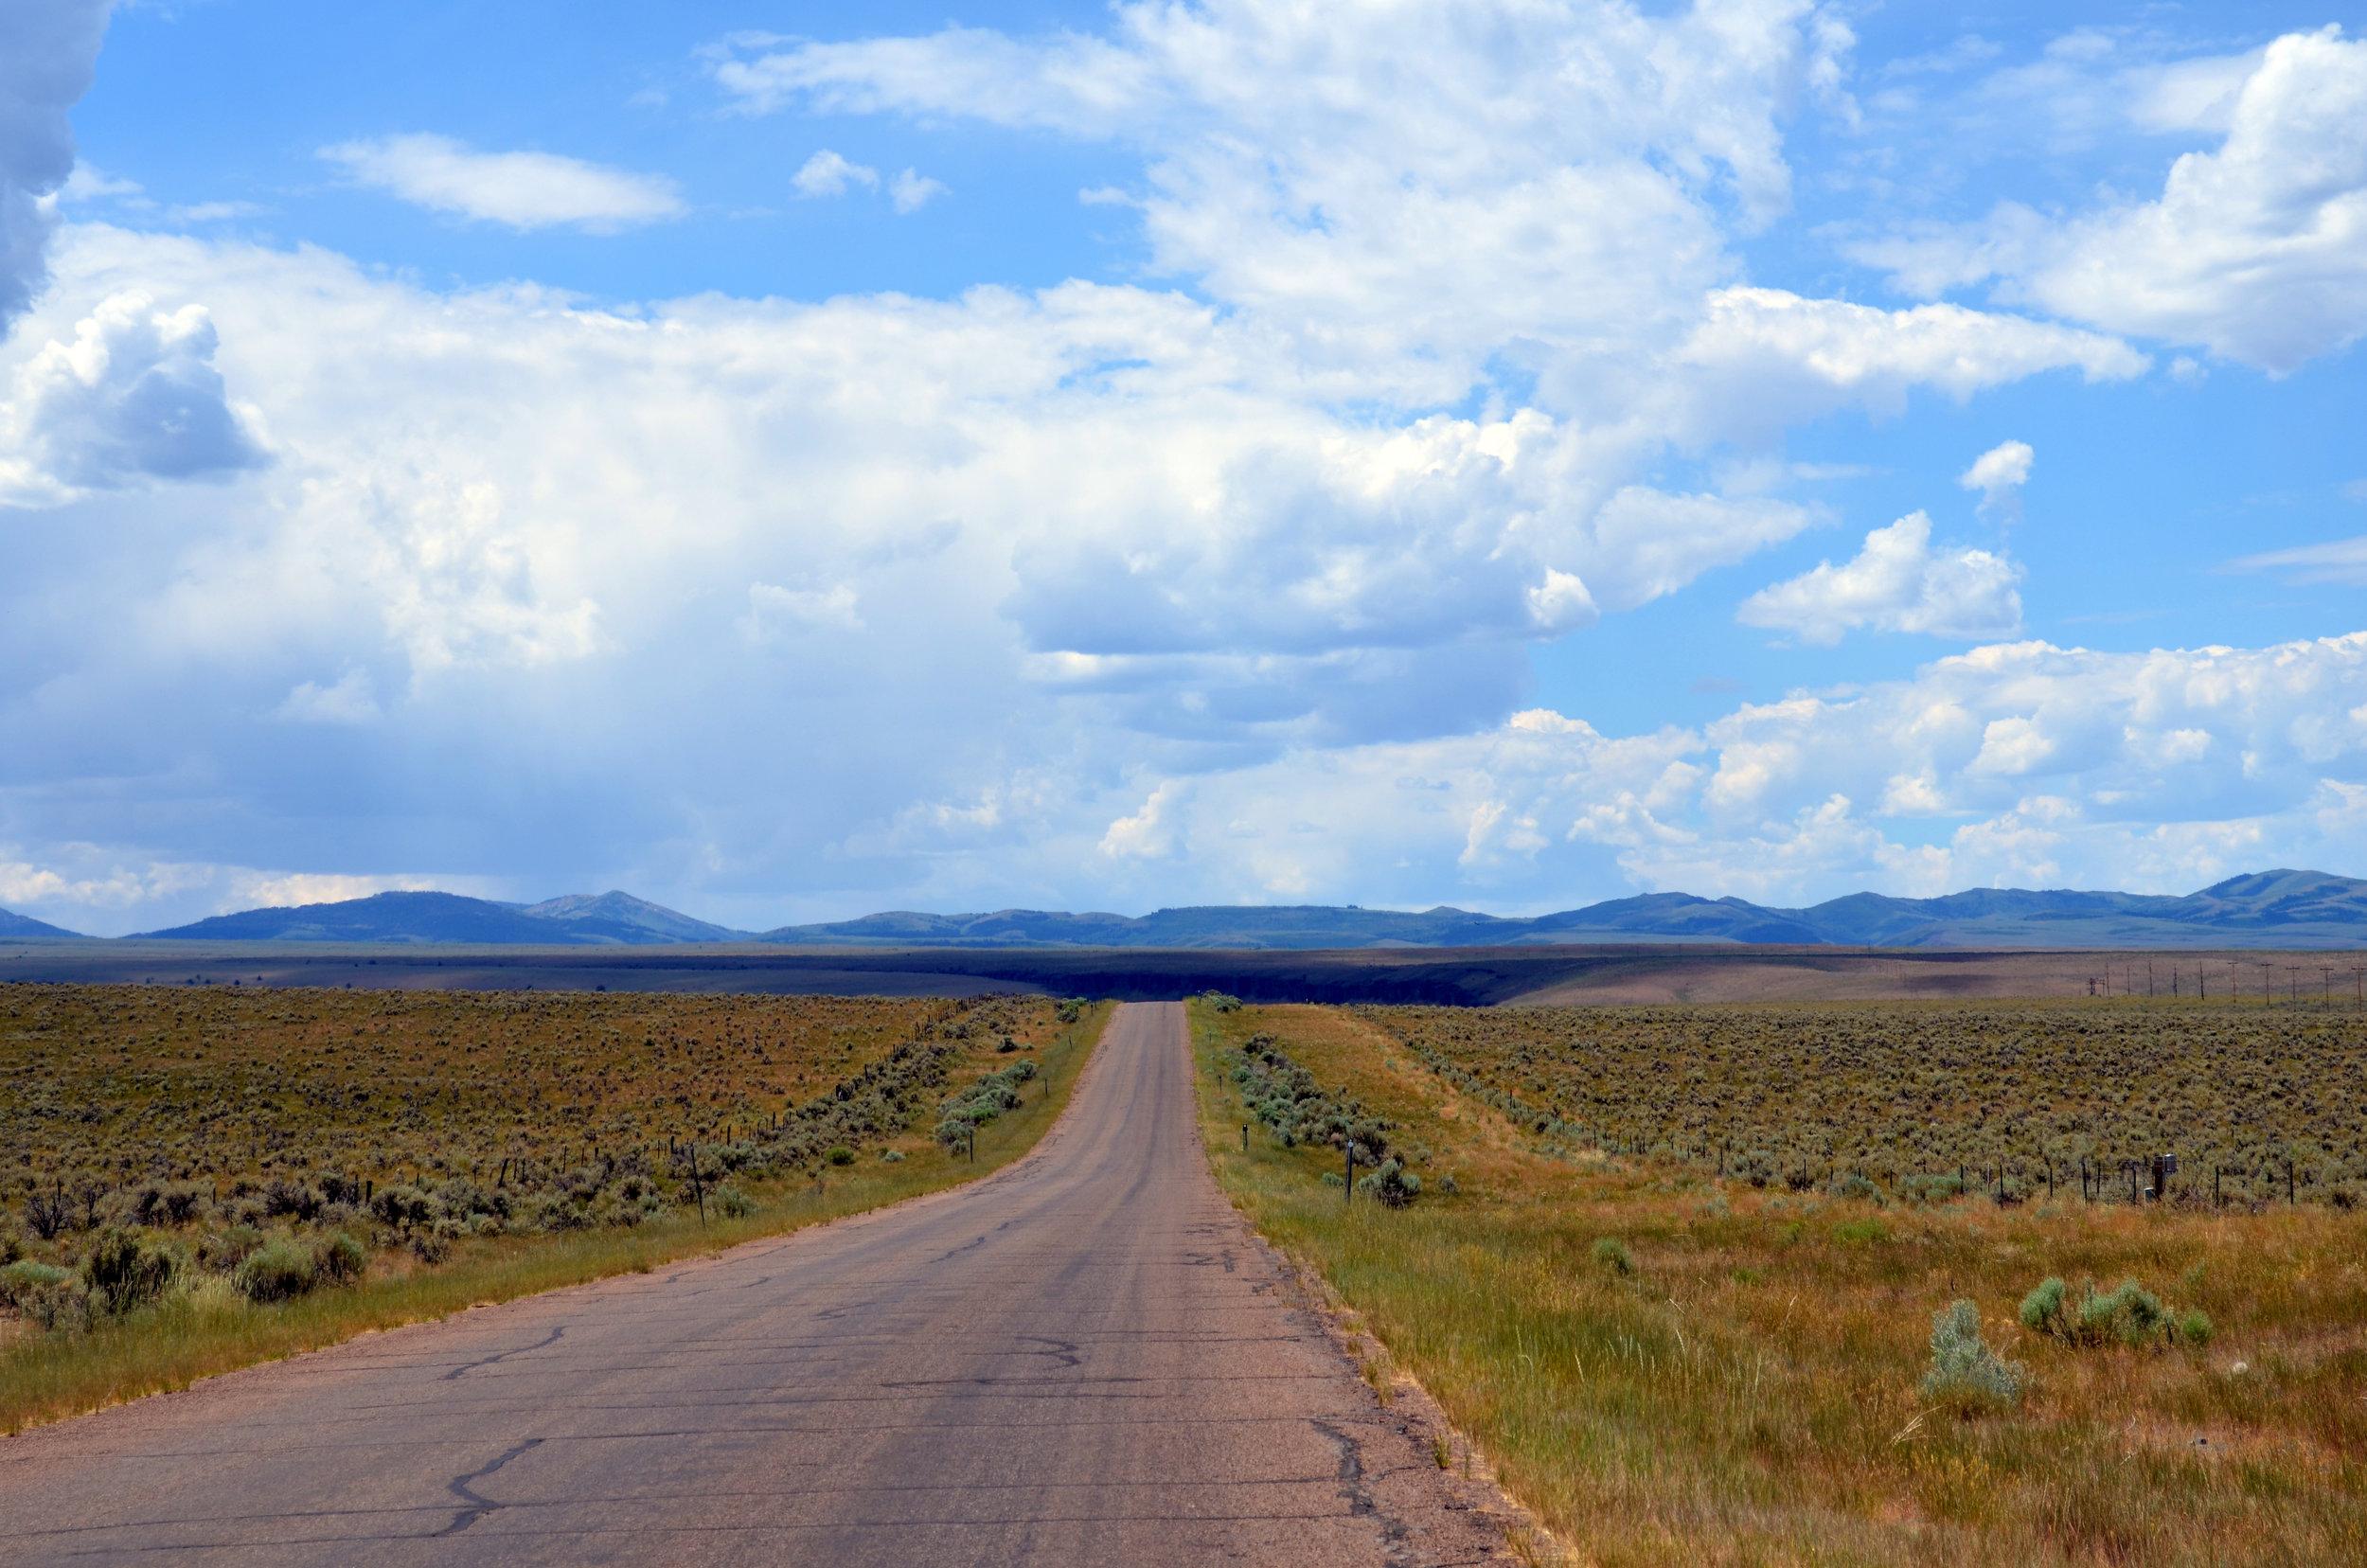 On the road to Rancho del Cielo Azul (NV012)